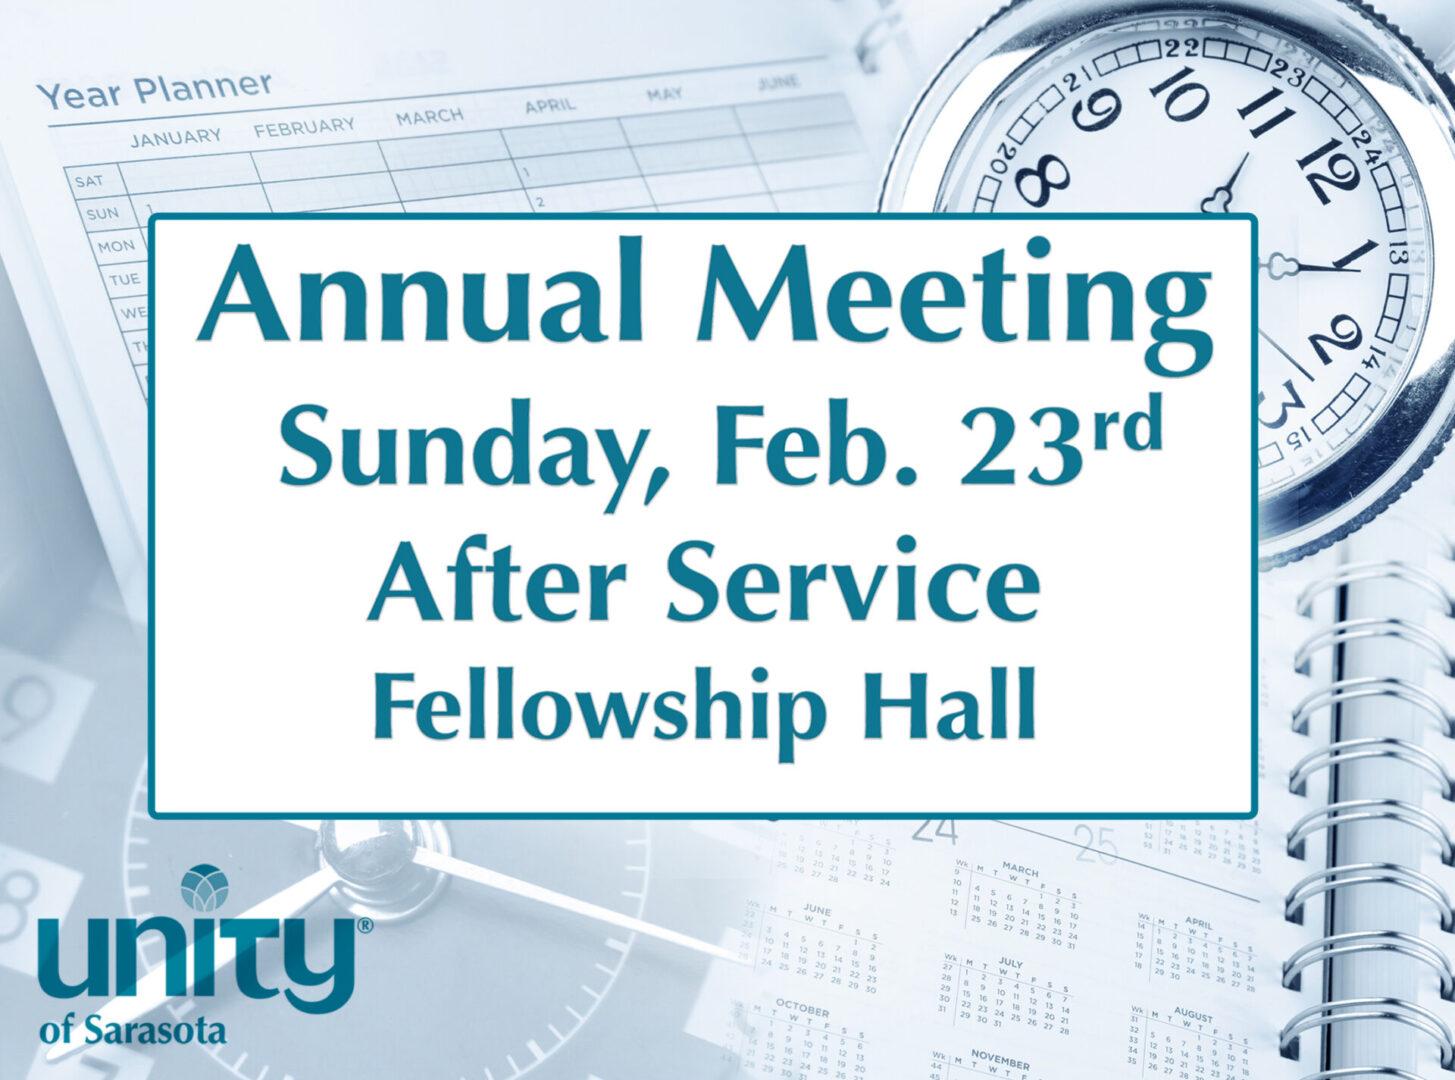 Annual Meeting 2020 at Unity of Sarasota